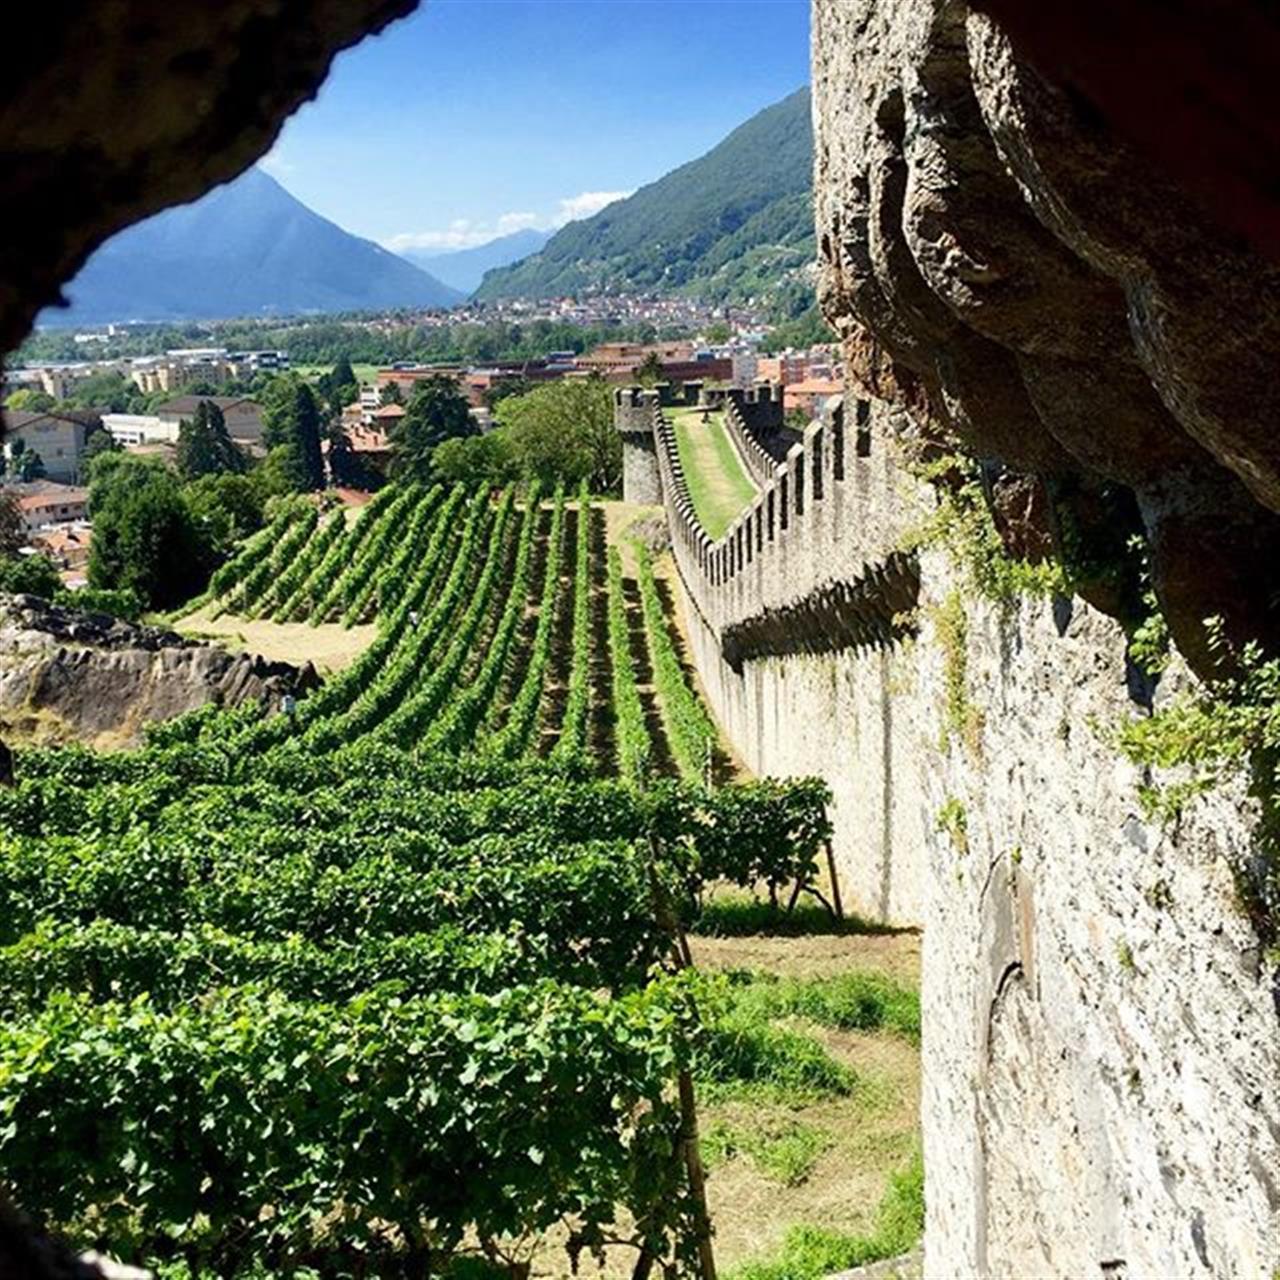 View on vineyards Castelgrande Bellinzona. Ticino, Switzerland #lakemaggiore #ticino #switzerland